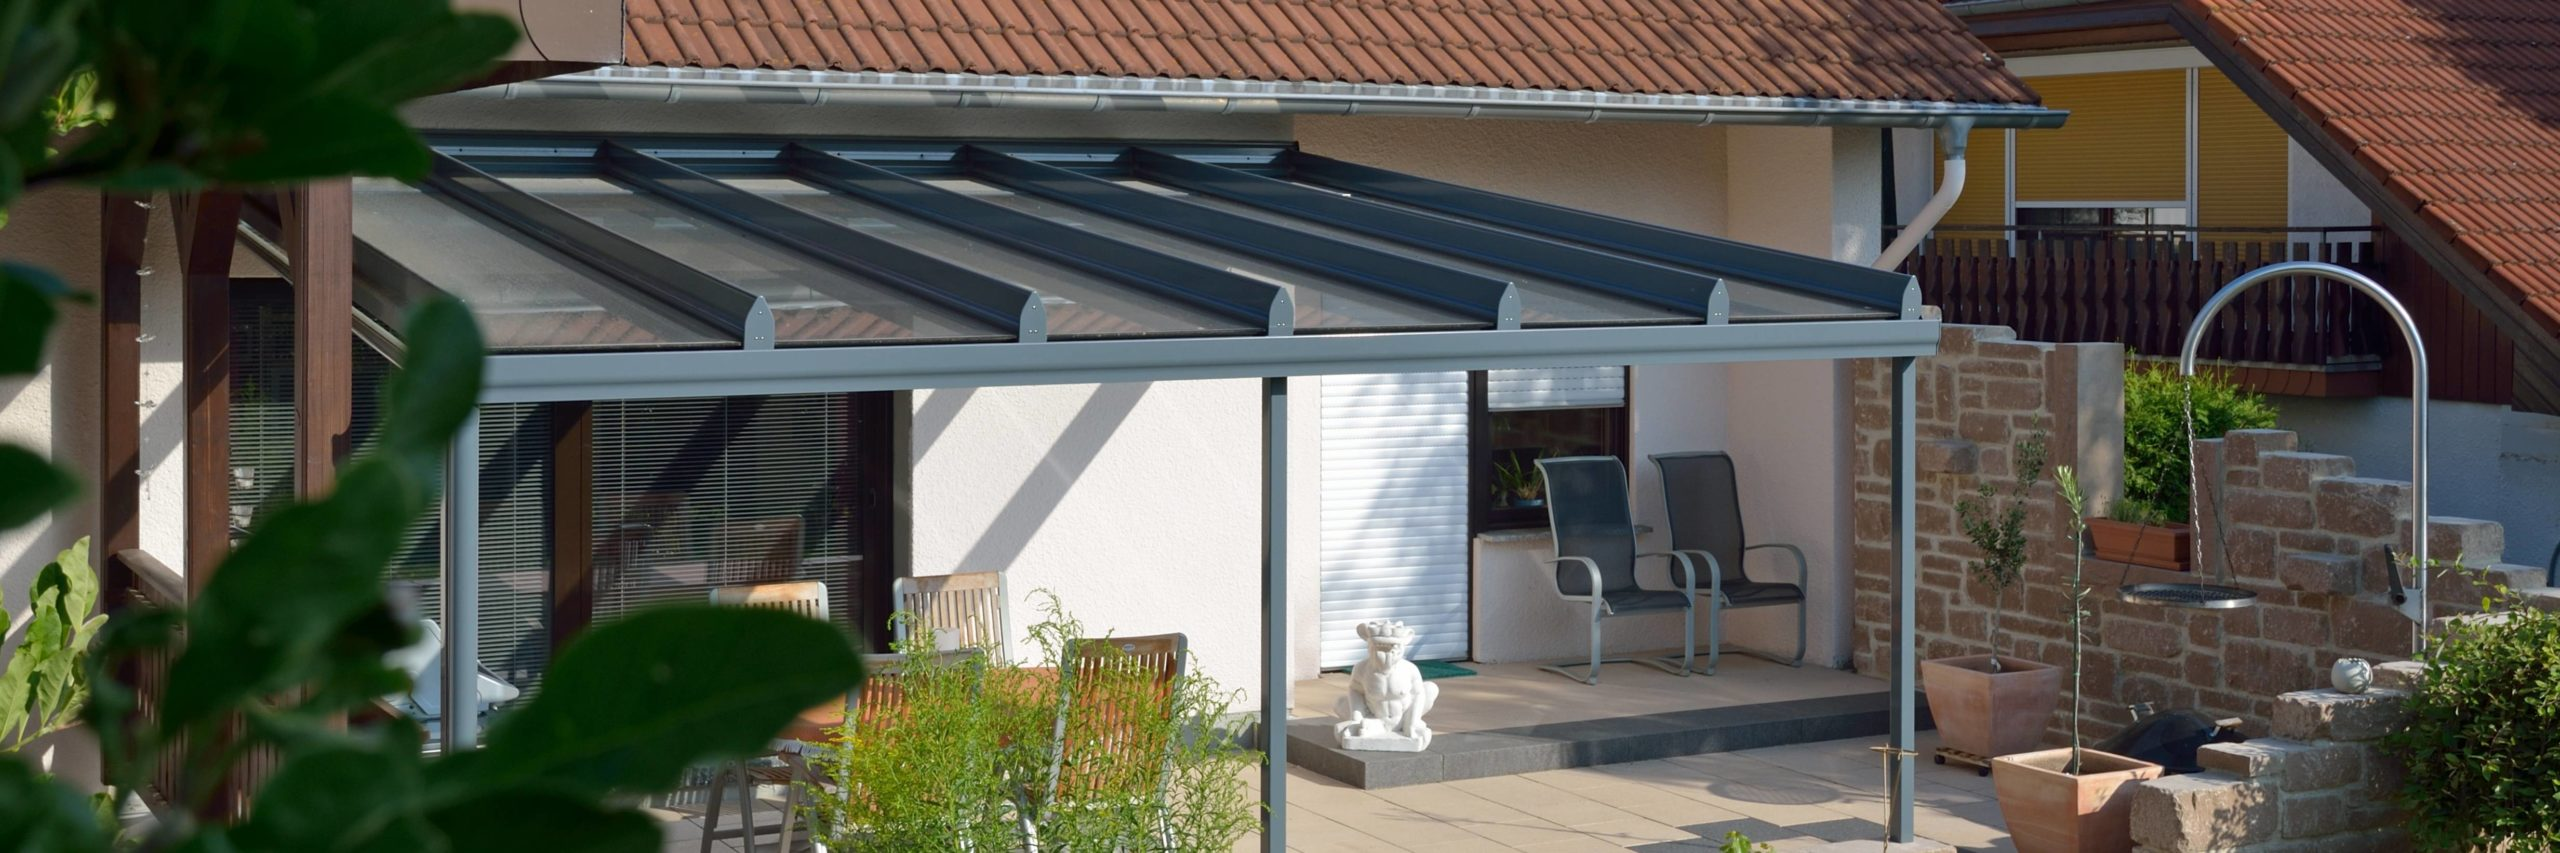 Toskana-Design Terrassendach